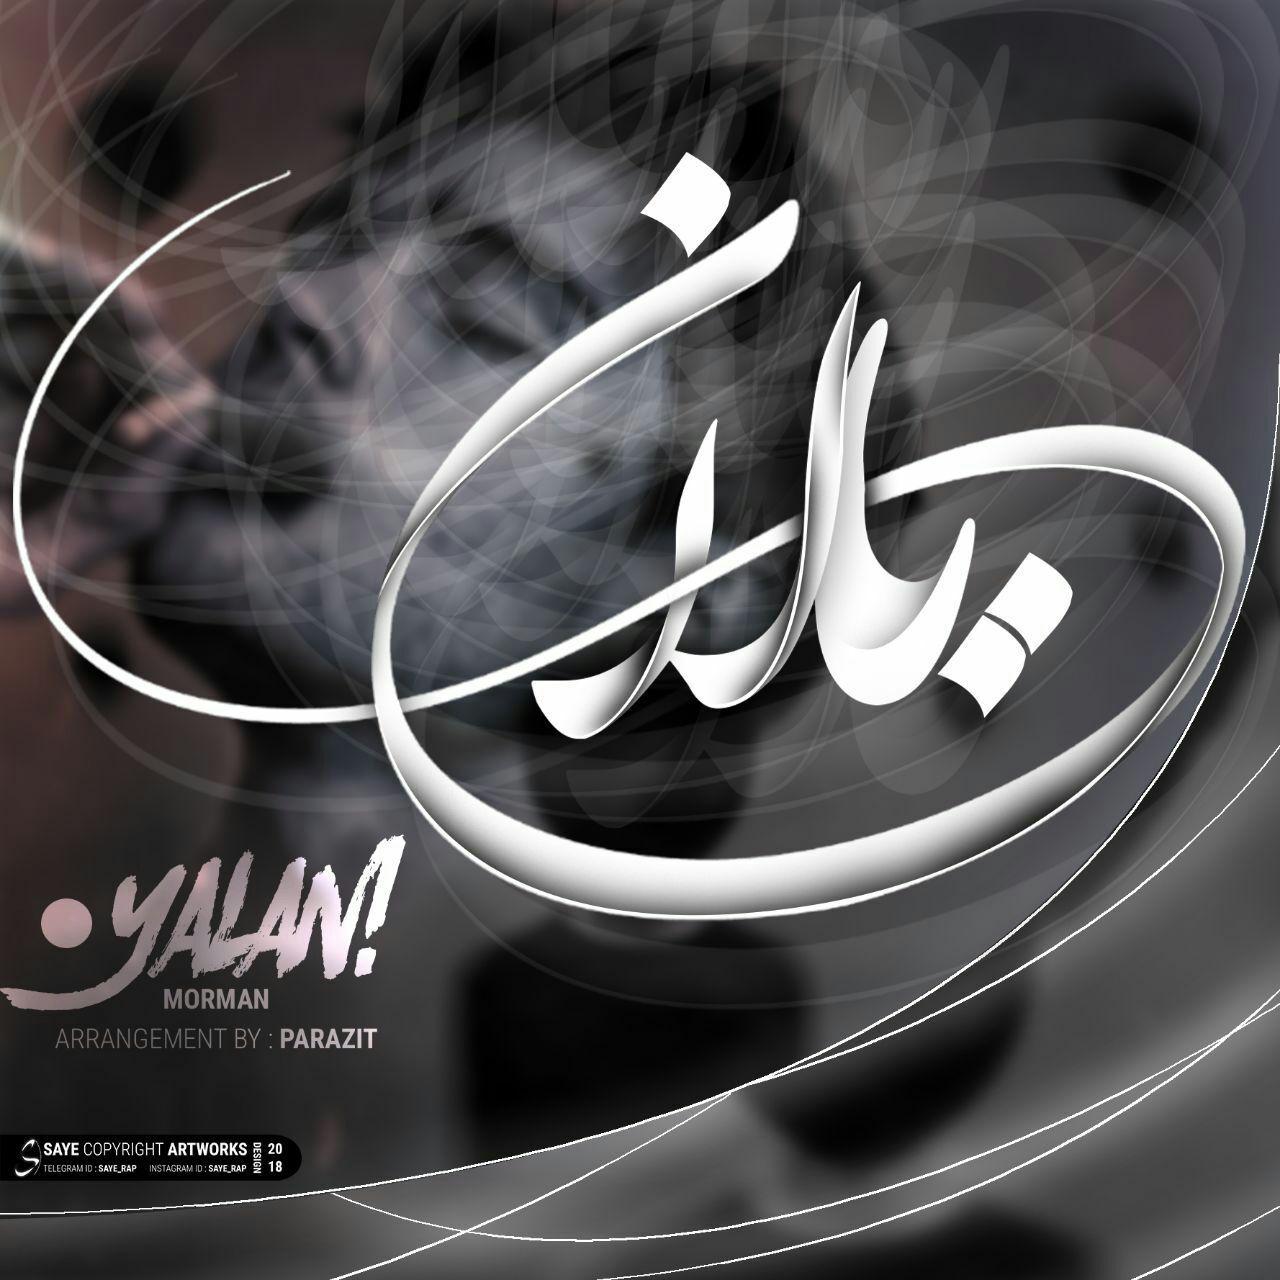 http://s9.picofile.com/file/8329879384/42Morman_Yalan.jpg